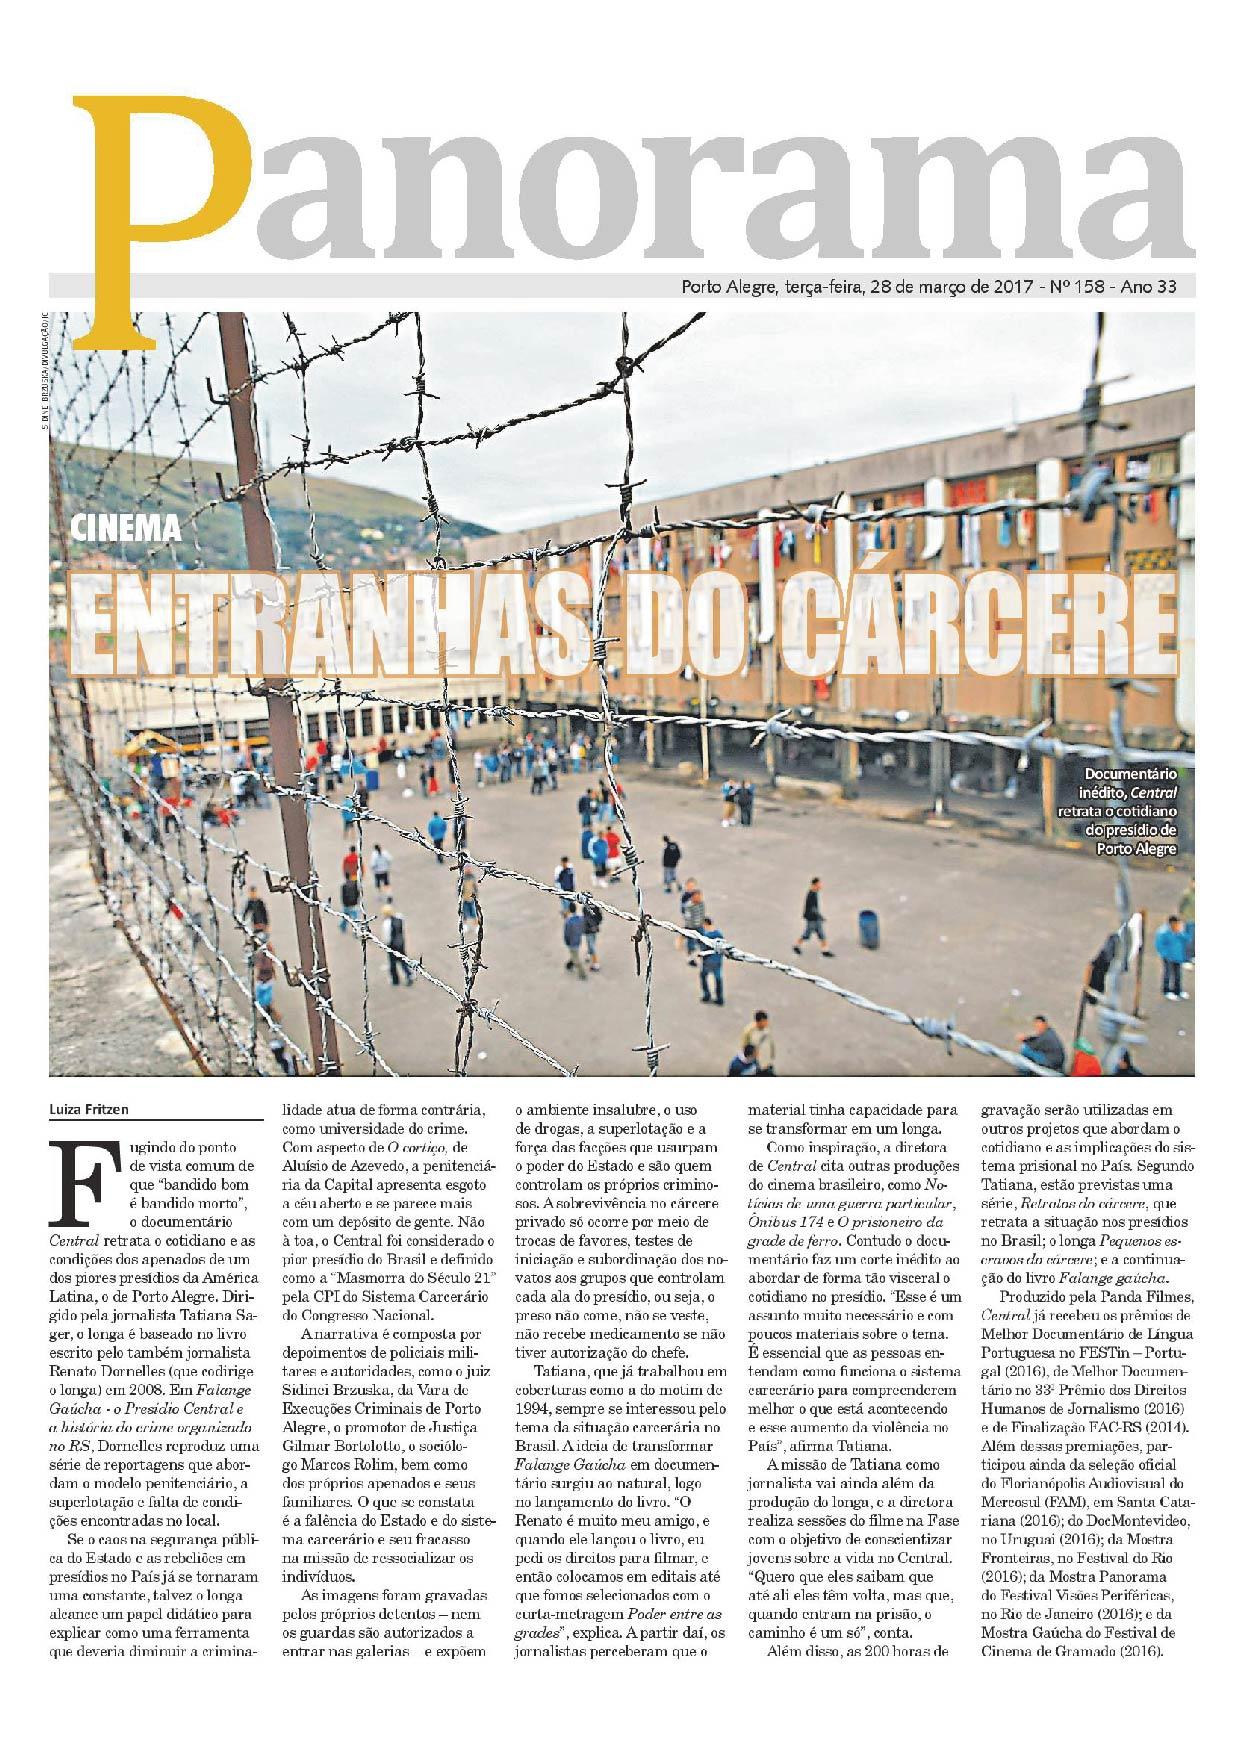 Panorama Jornal do Comércio | 28.03